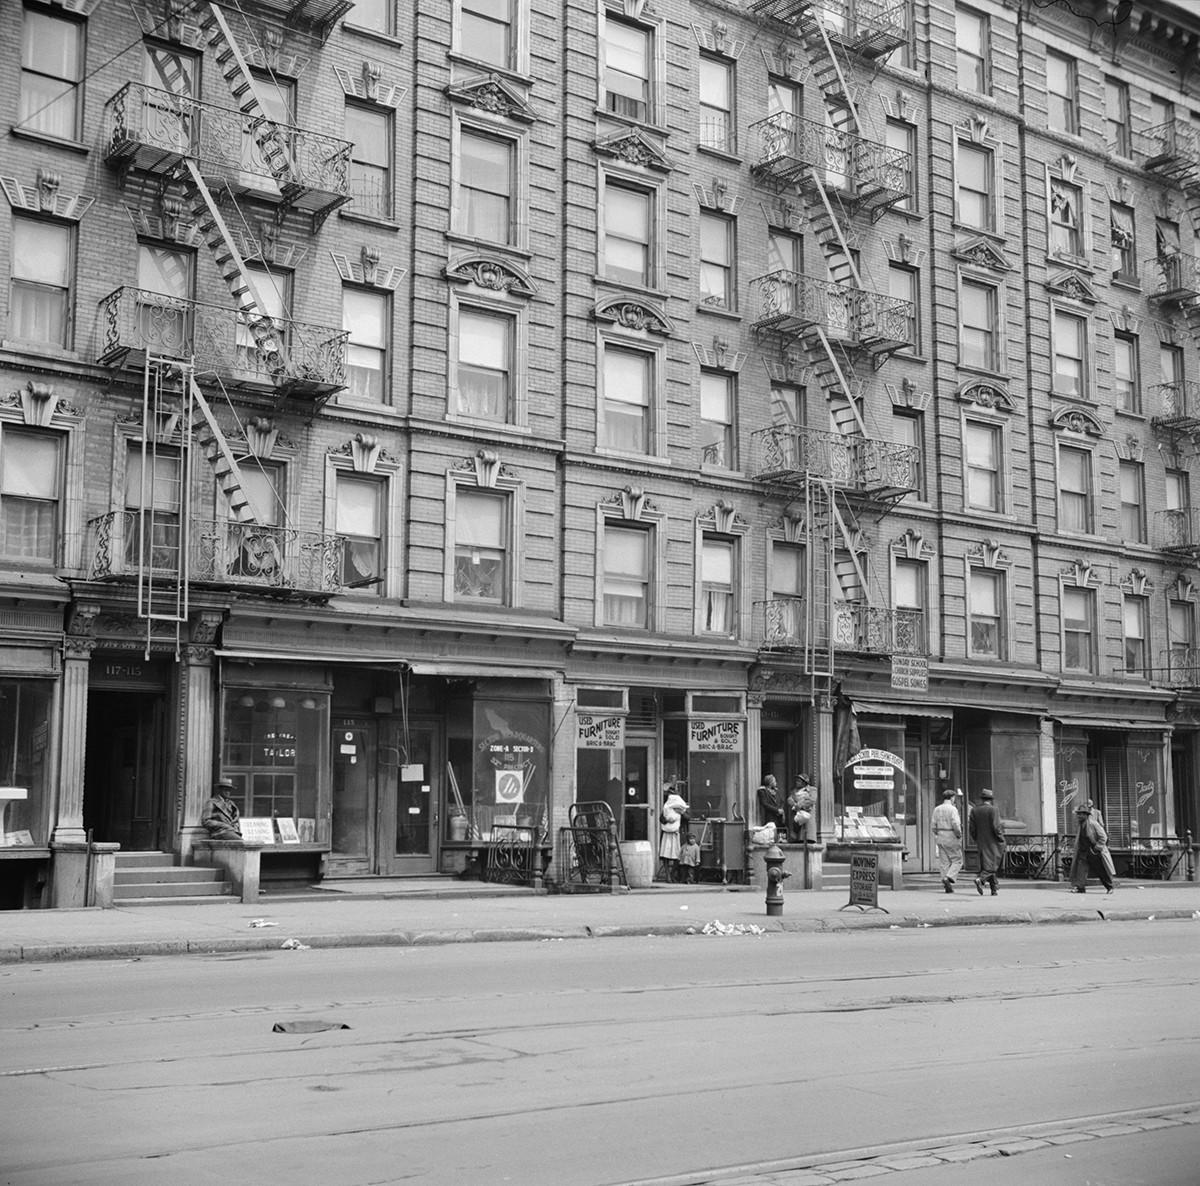 Gordon Parks, New York, New York. Harlem apartment house, 1943